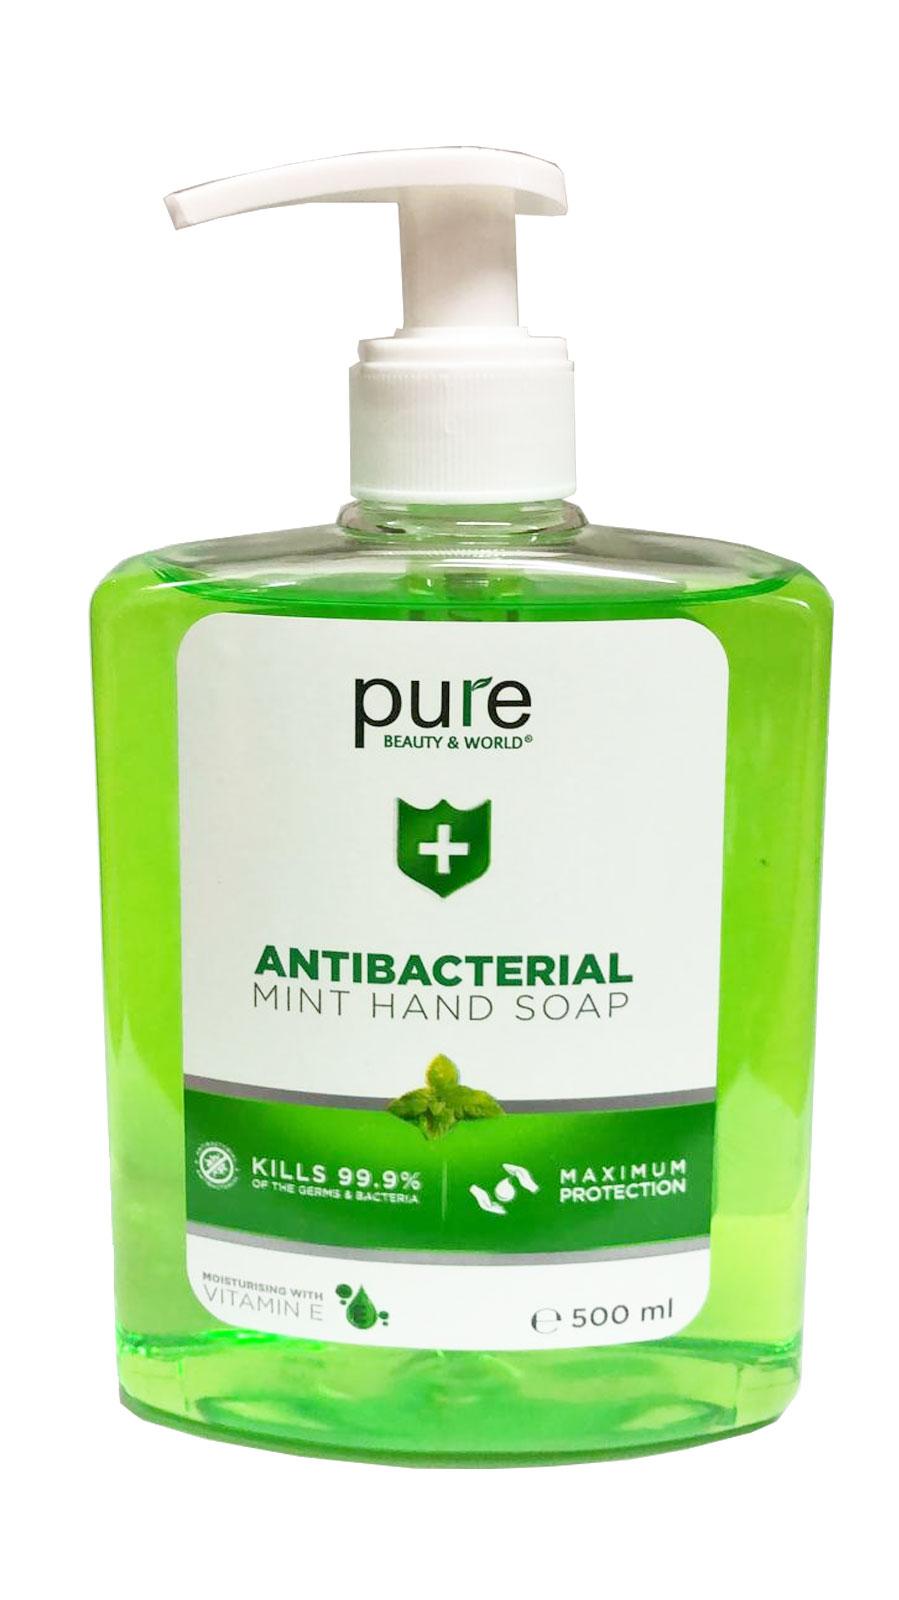 Antibacterial Mint Hand Soap (500ml)